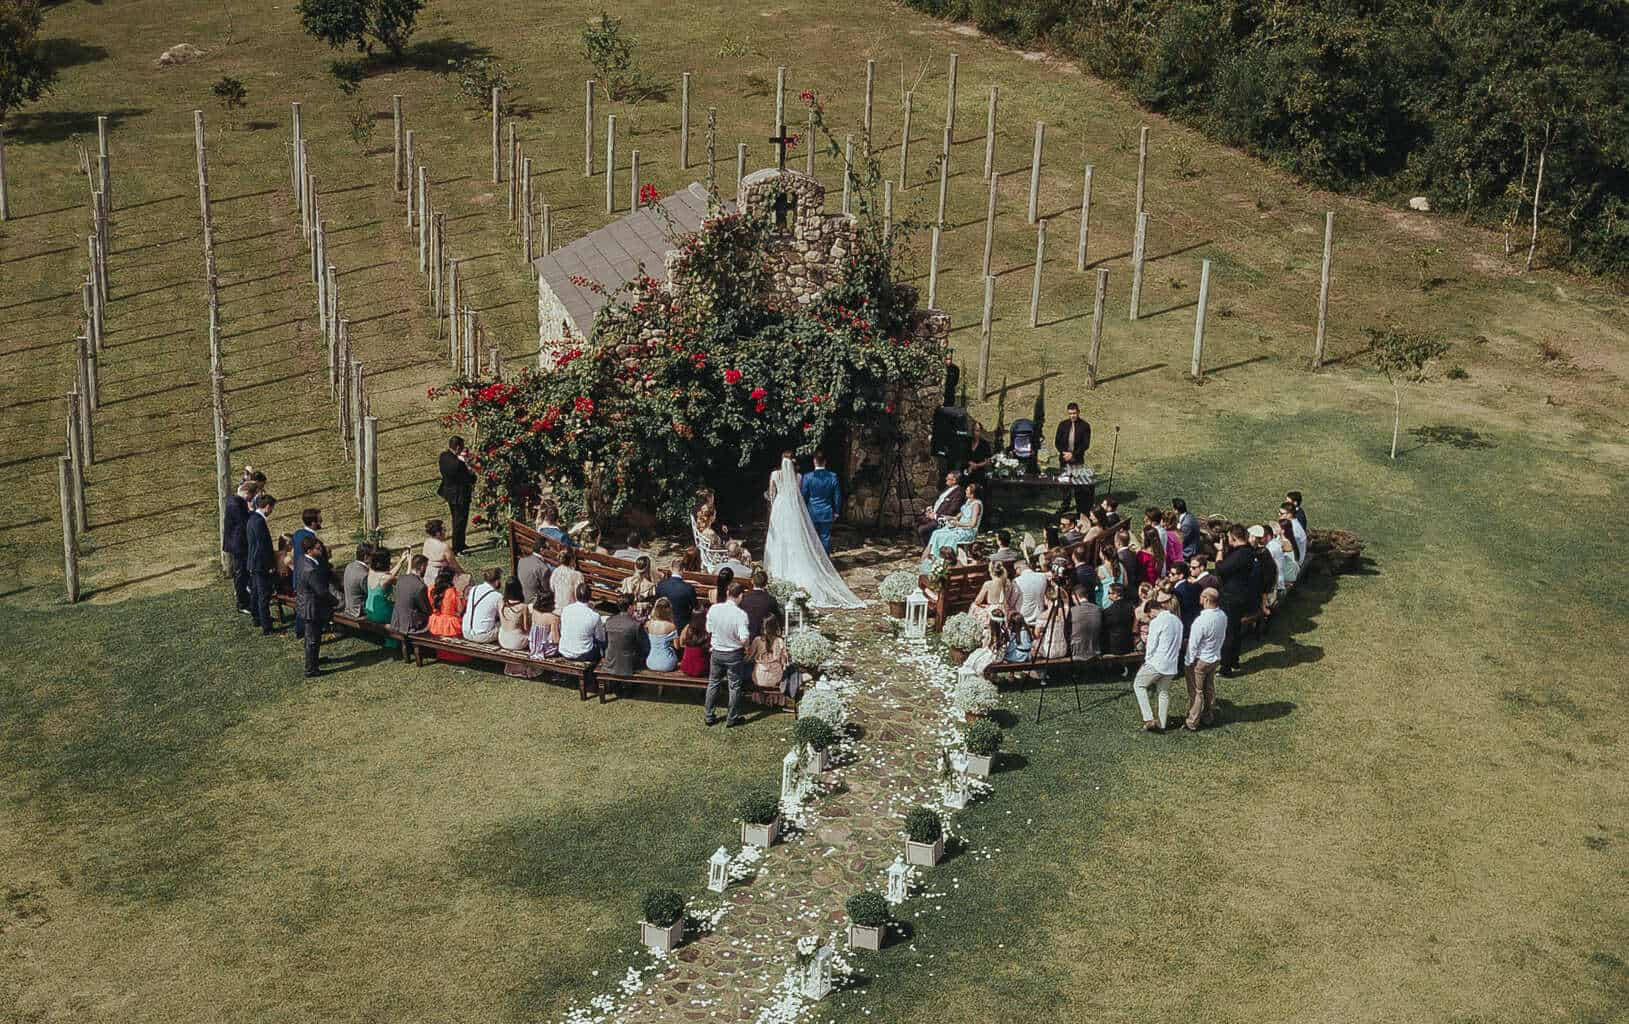 debora-e-willian-arq-flora-villa-casarao-florianopolis-46411190504AndreVanzin464